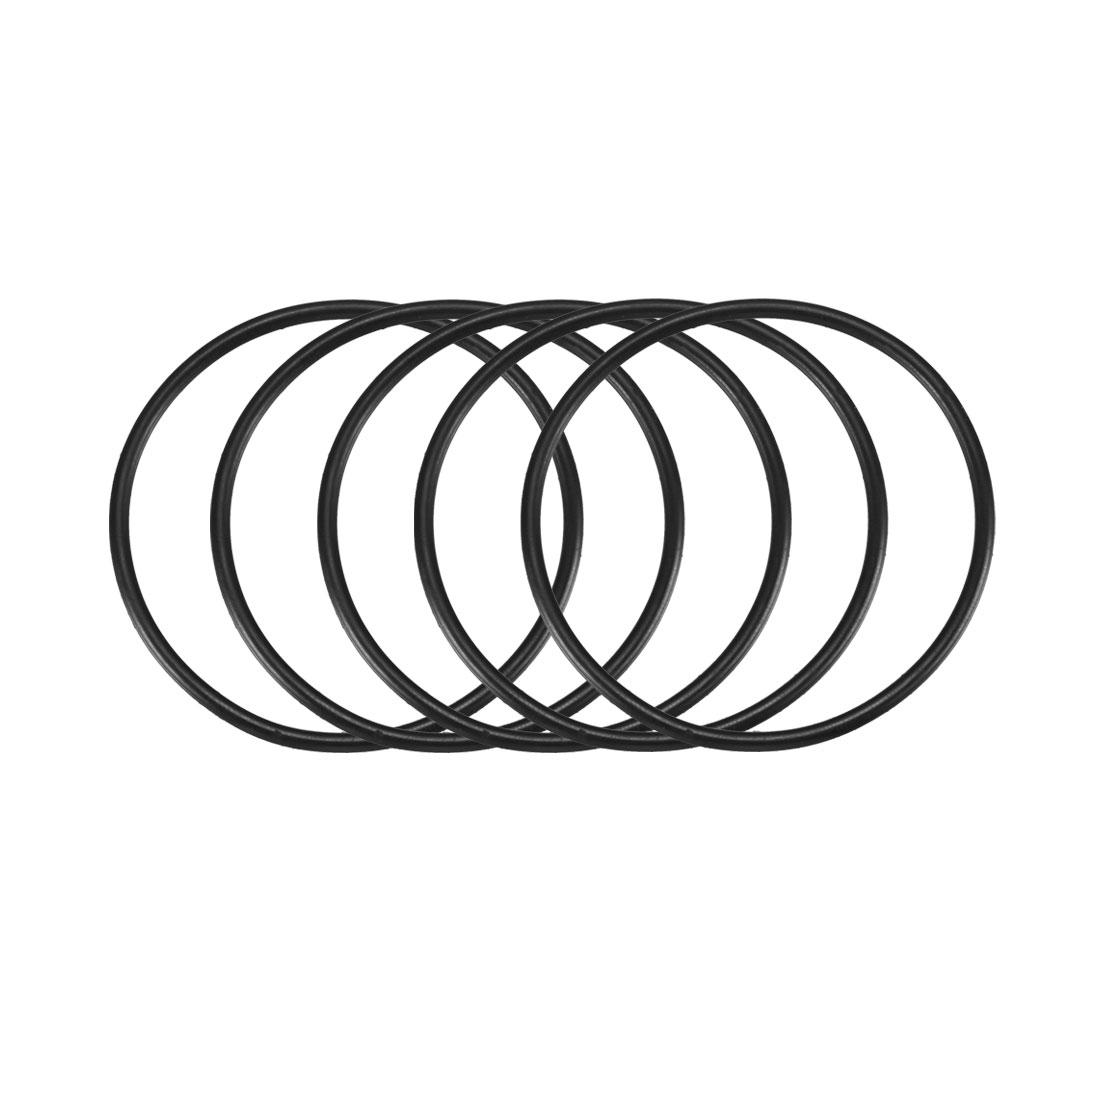 25 Pcs Black Nitrile Rubber Grommets Oil Sealings Gaskets Washers O Rings 55mm x 2.5mm x 50mm